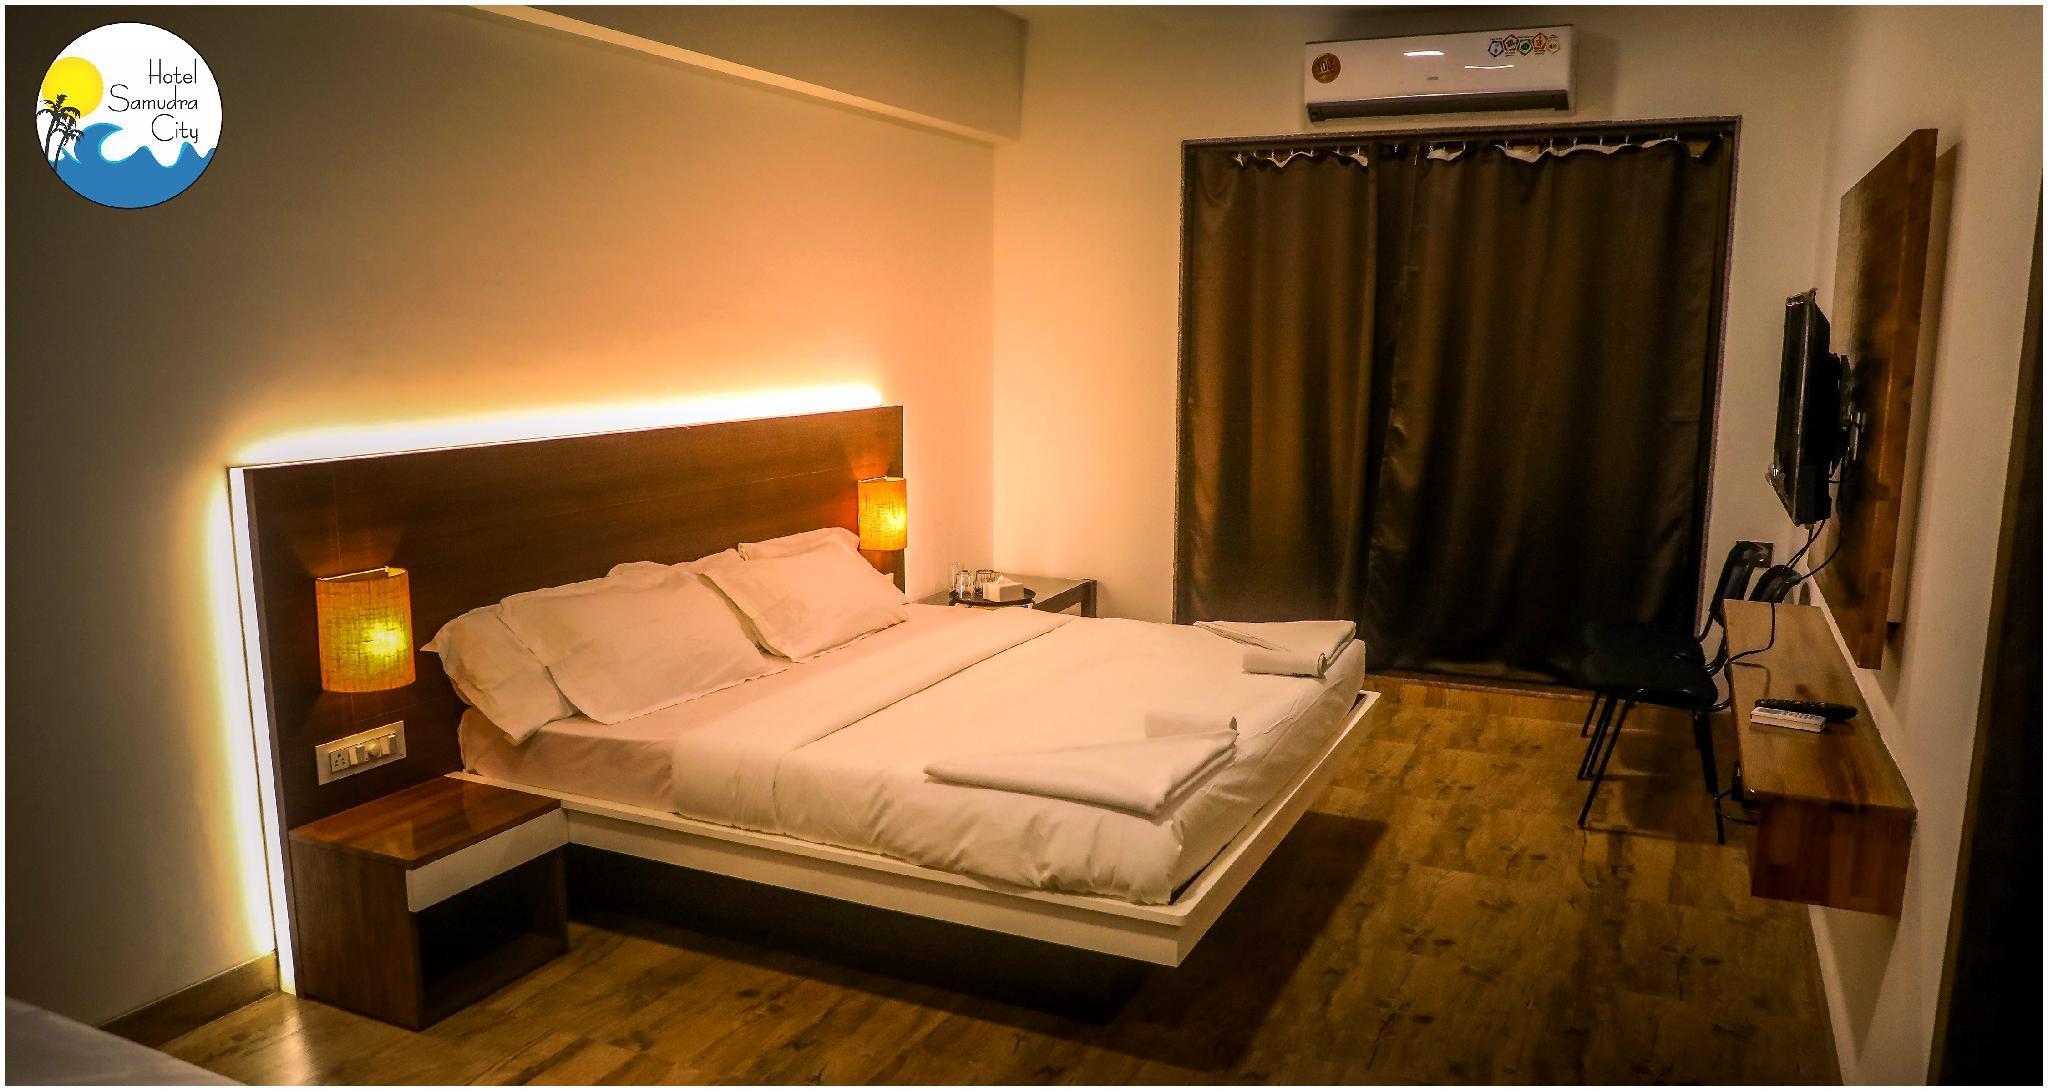 Hotel Samudra City